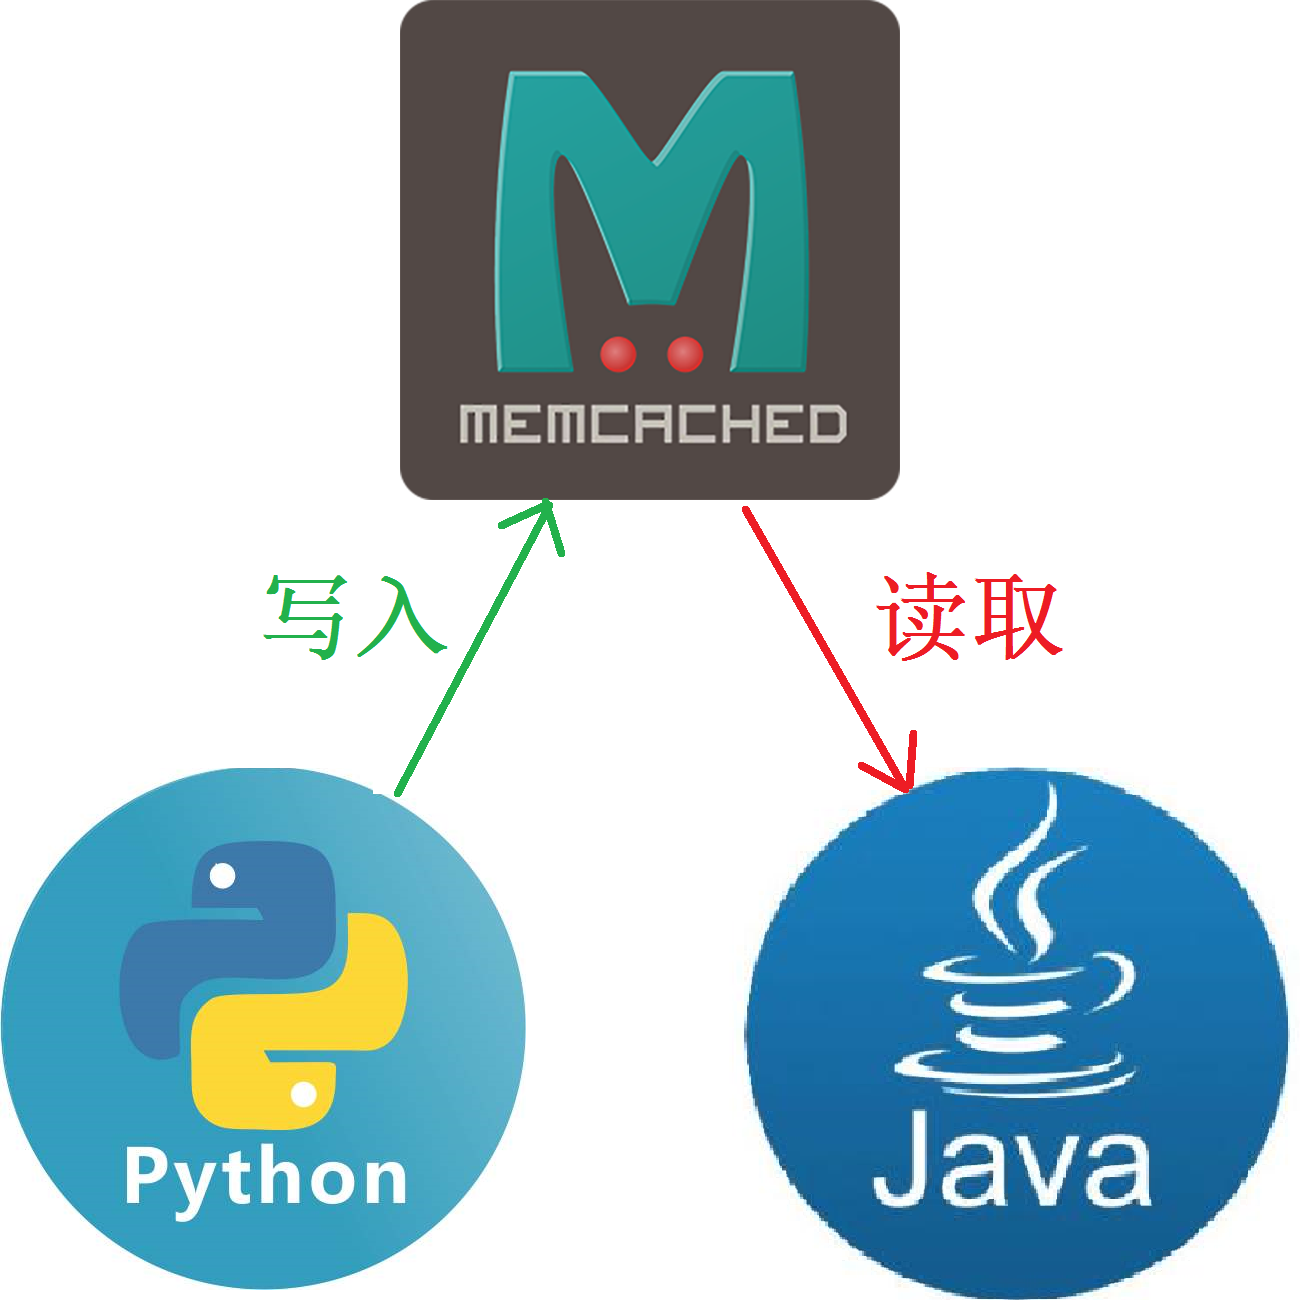 Python写入Memcached但Java读不到